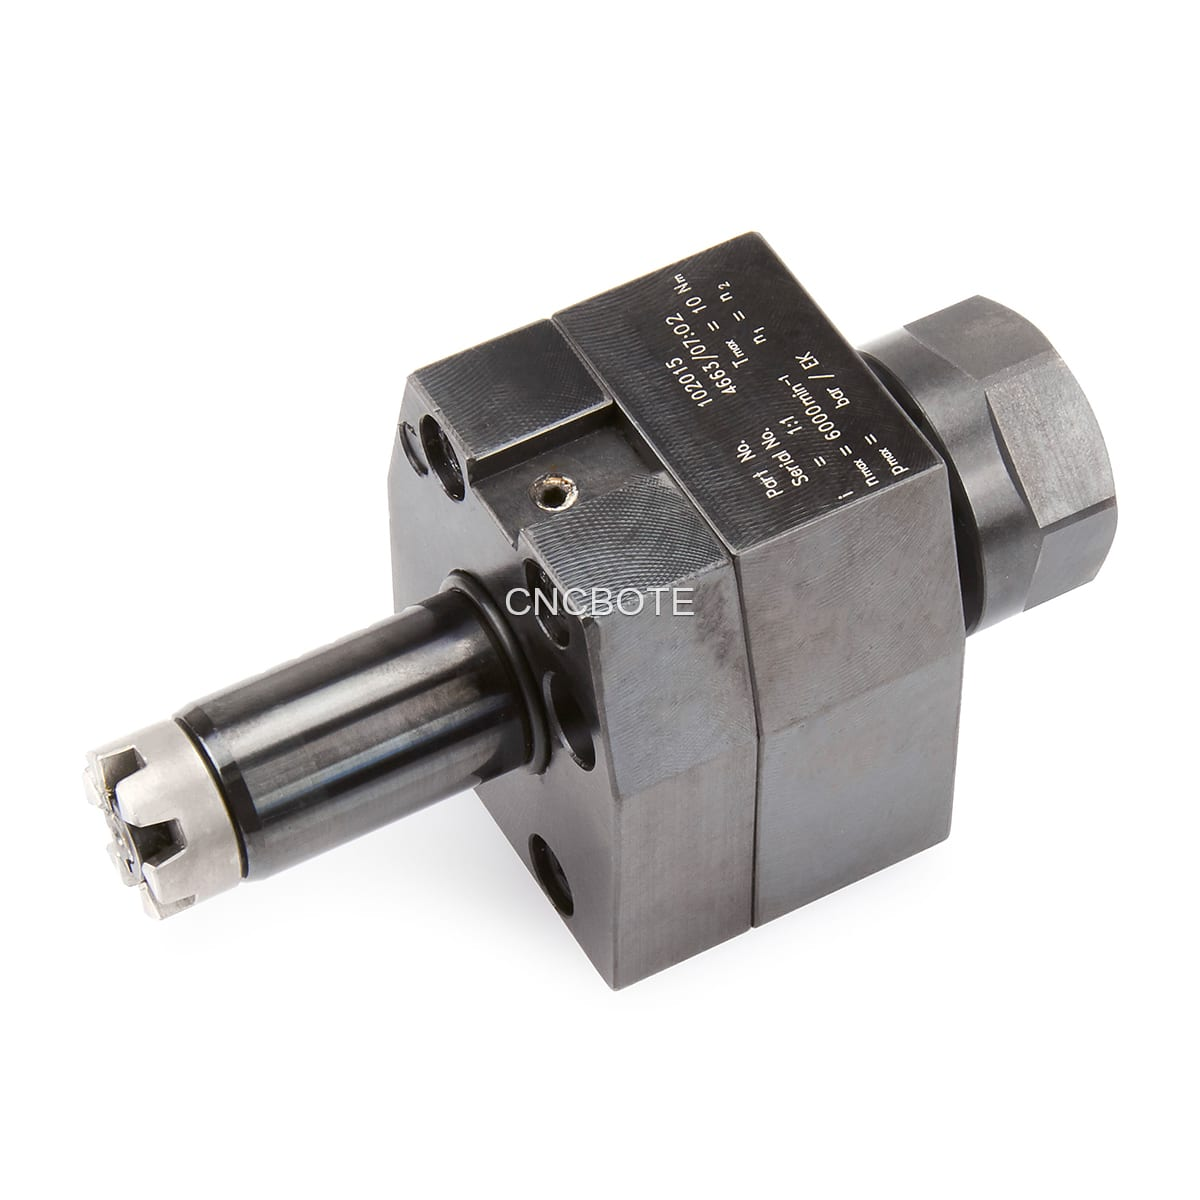 Spinner VDI 20 angetriebenes Werkzeug axial, ER20, Baruffaldi